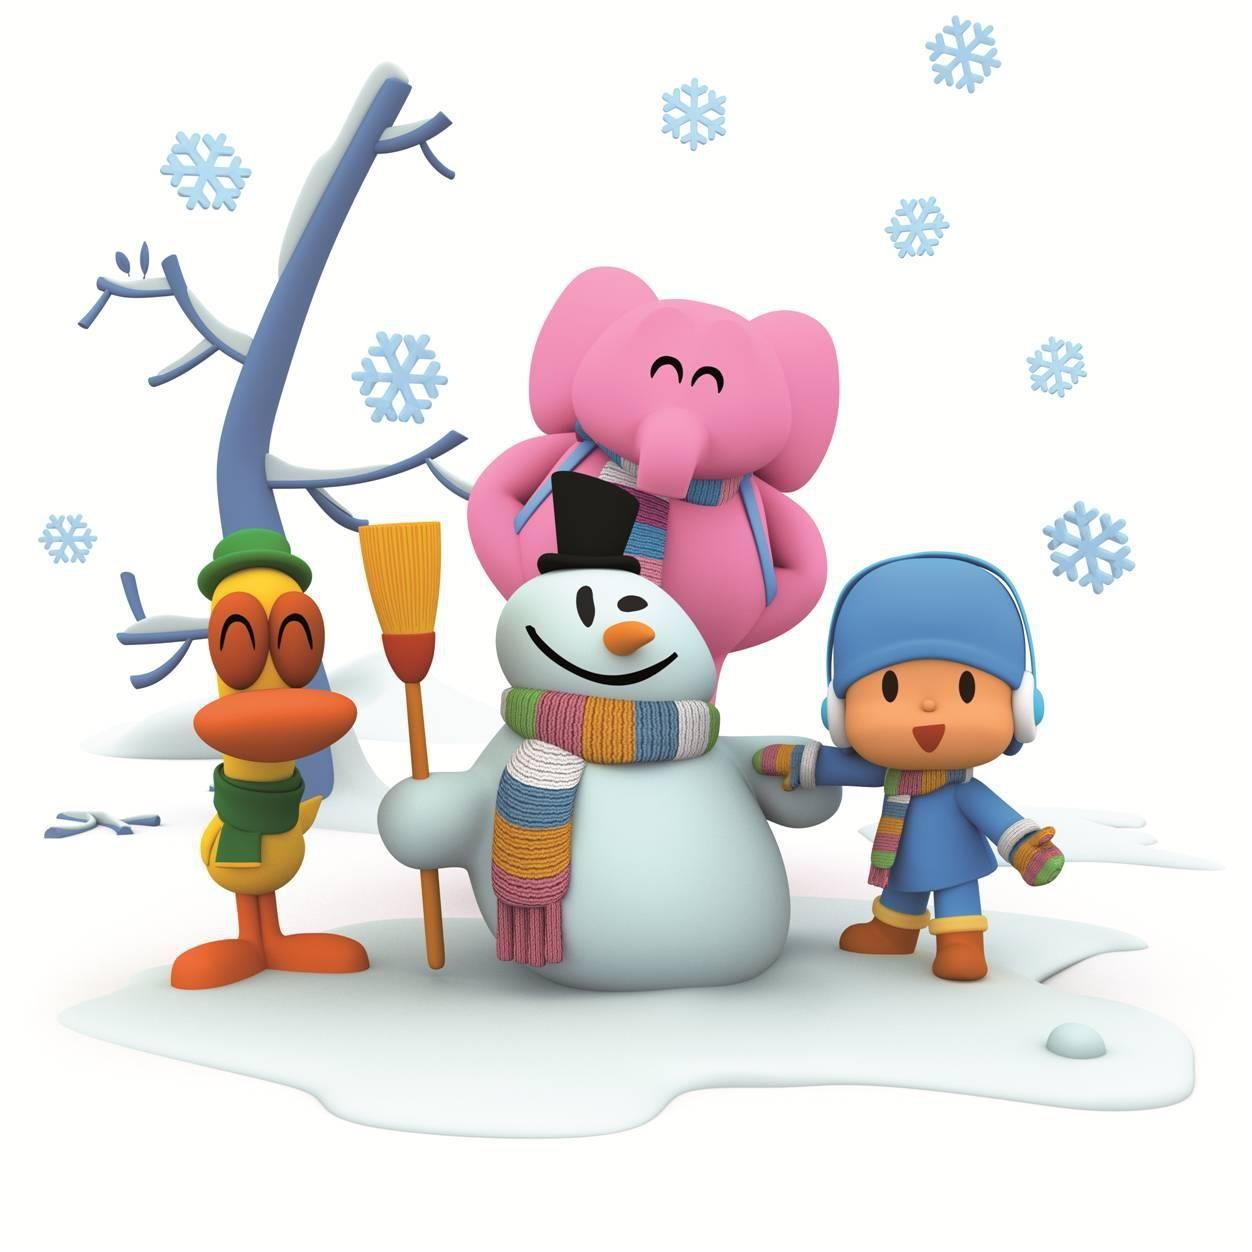 Pocoyo y sus amigos. It´s Christmas. | Stuff to Buy | Pinterest ...